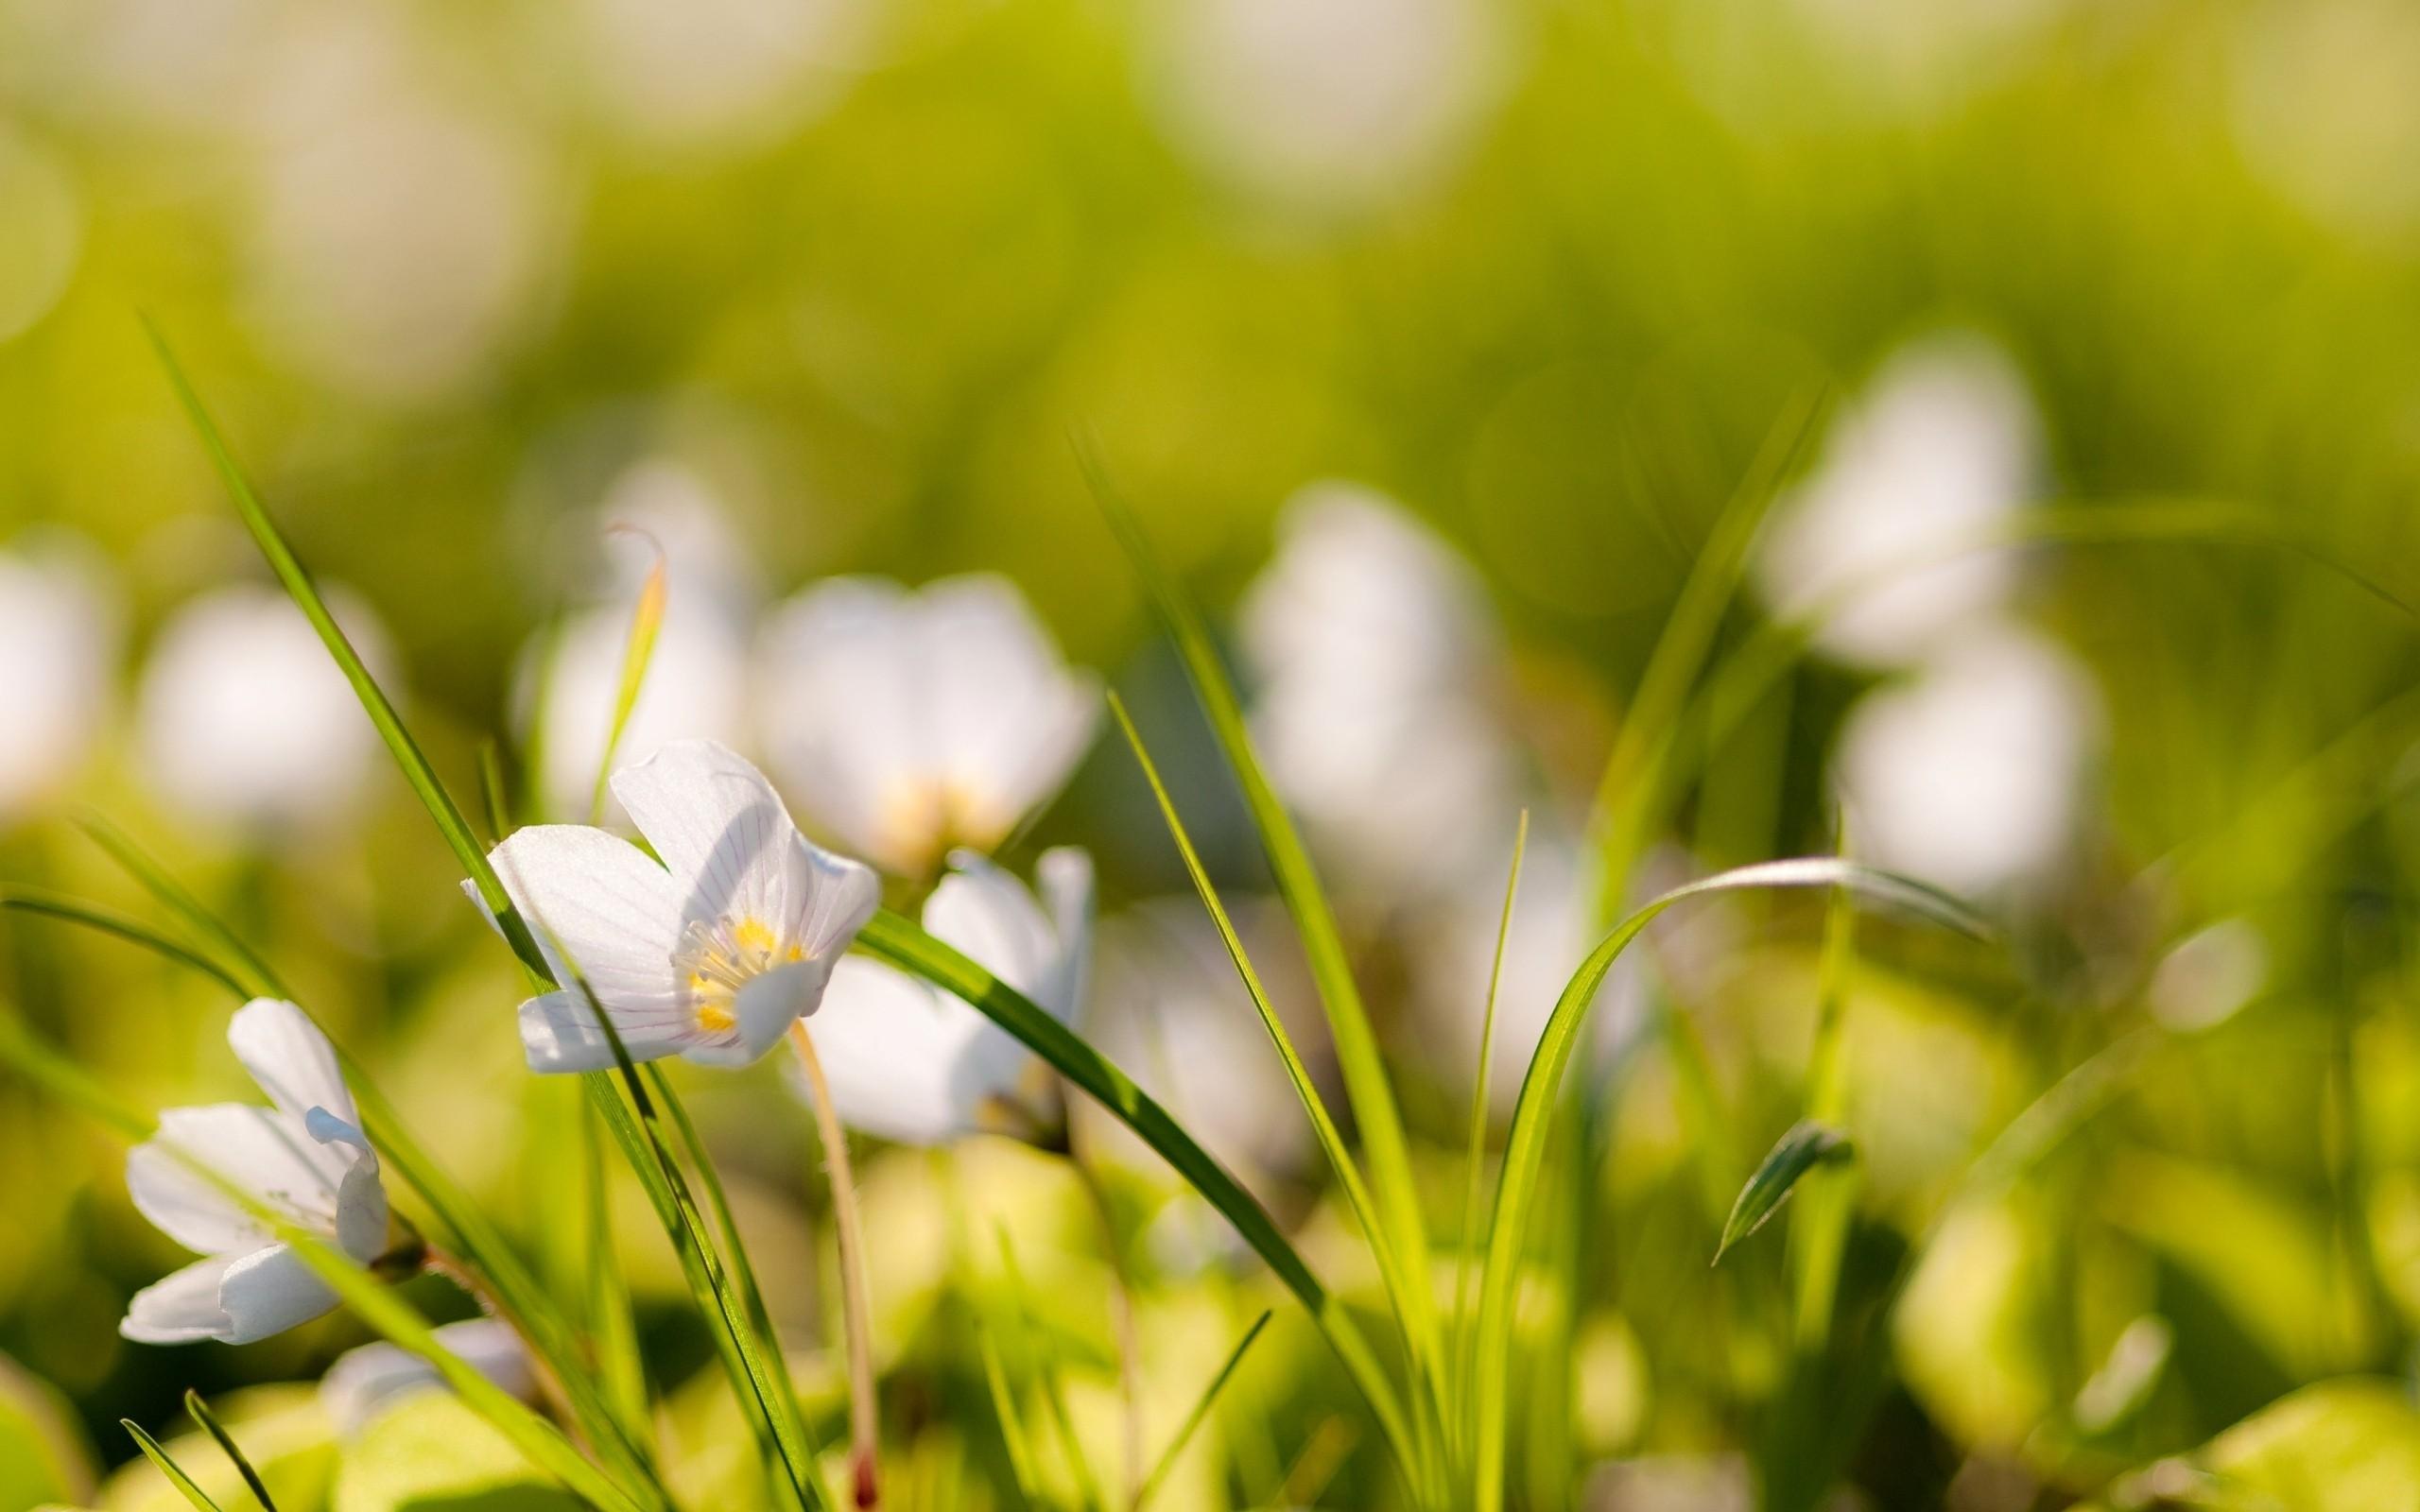 Pequenas flores blancas - 2560x1600